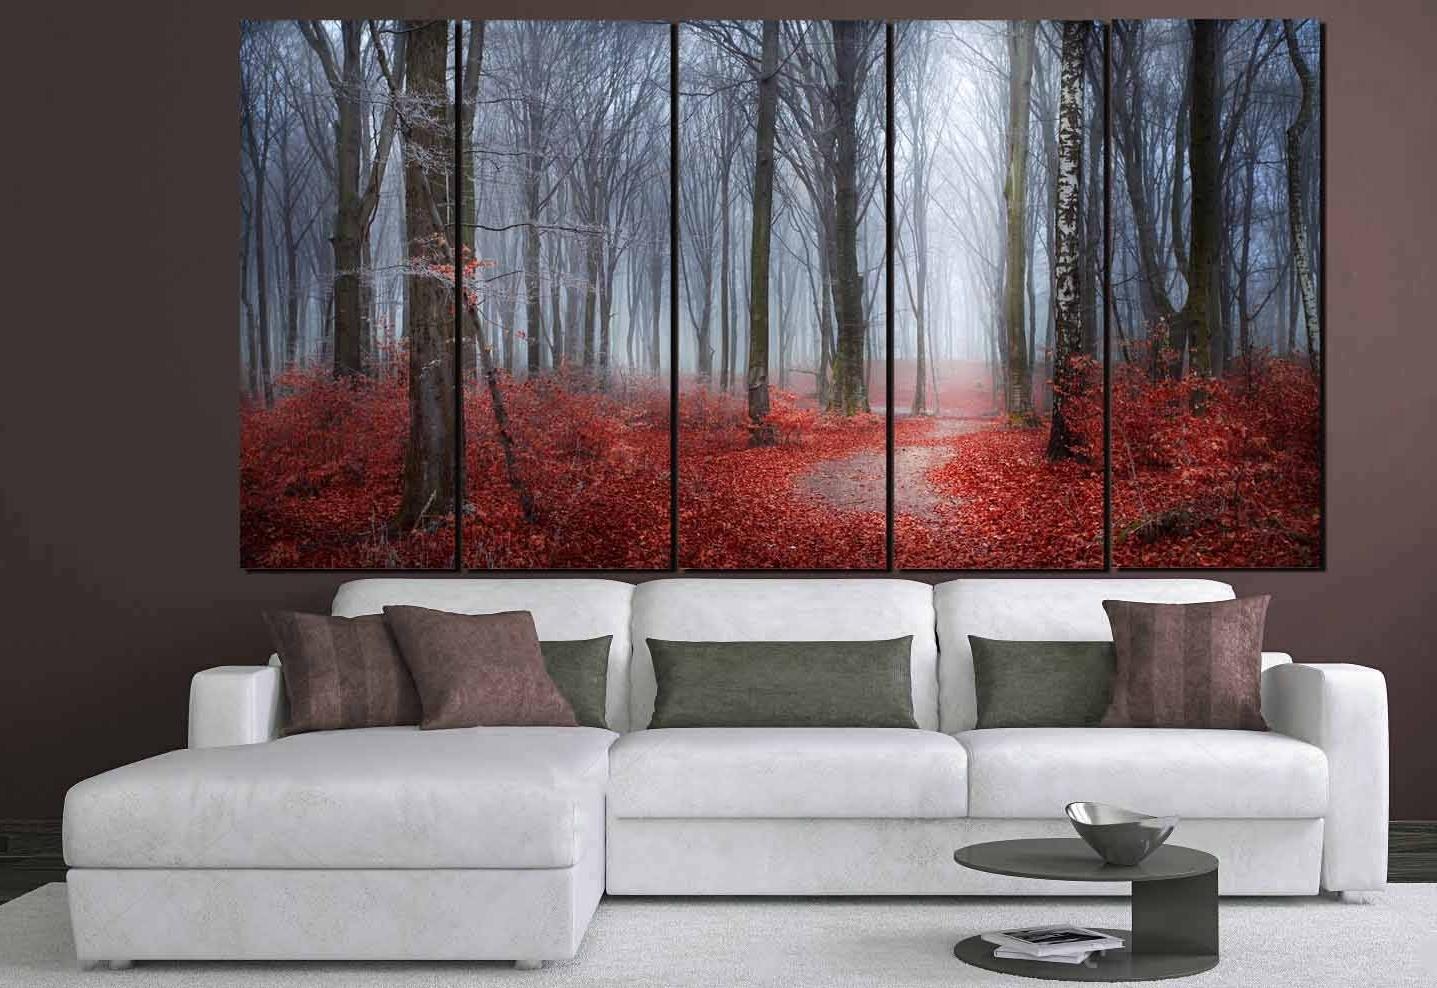 Nature Wall Art Regarding Latest Nature Wall Art,red Leaves Blue Mist Art,red Leaves Forest,nature (View 9 of 15)